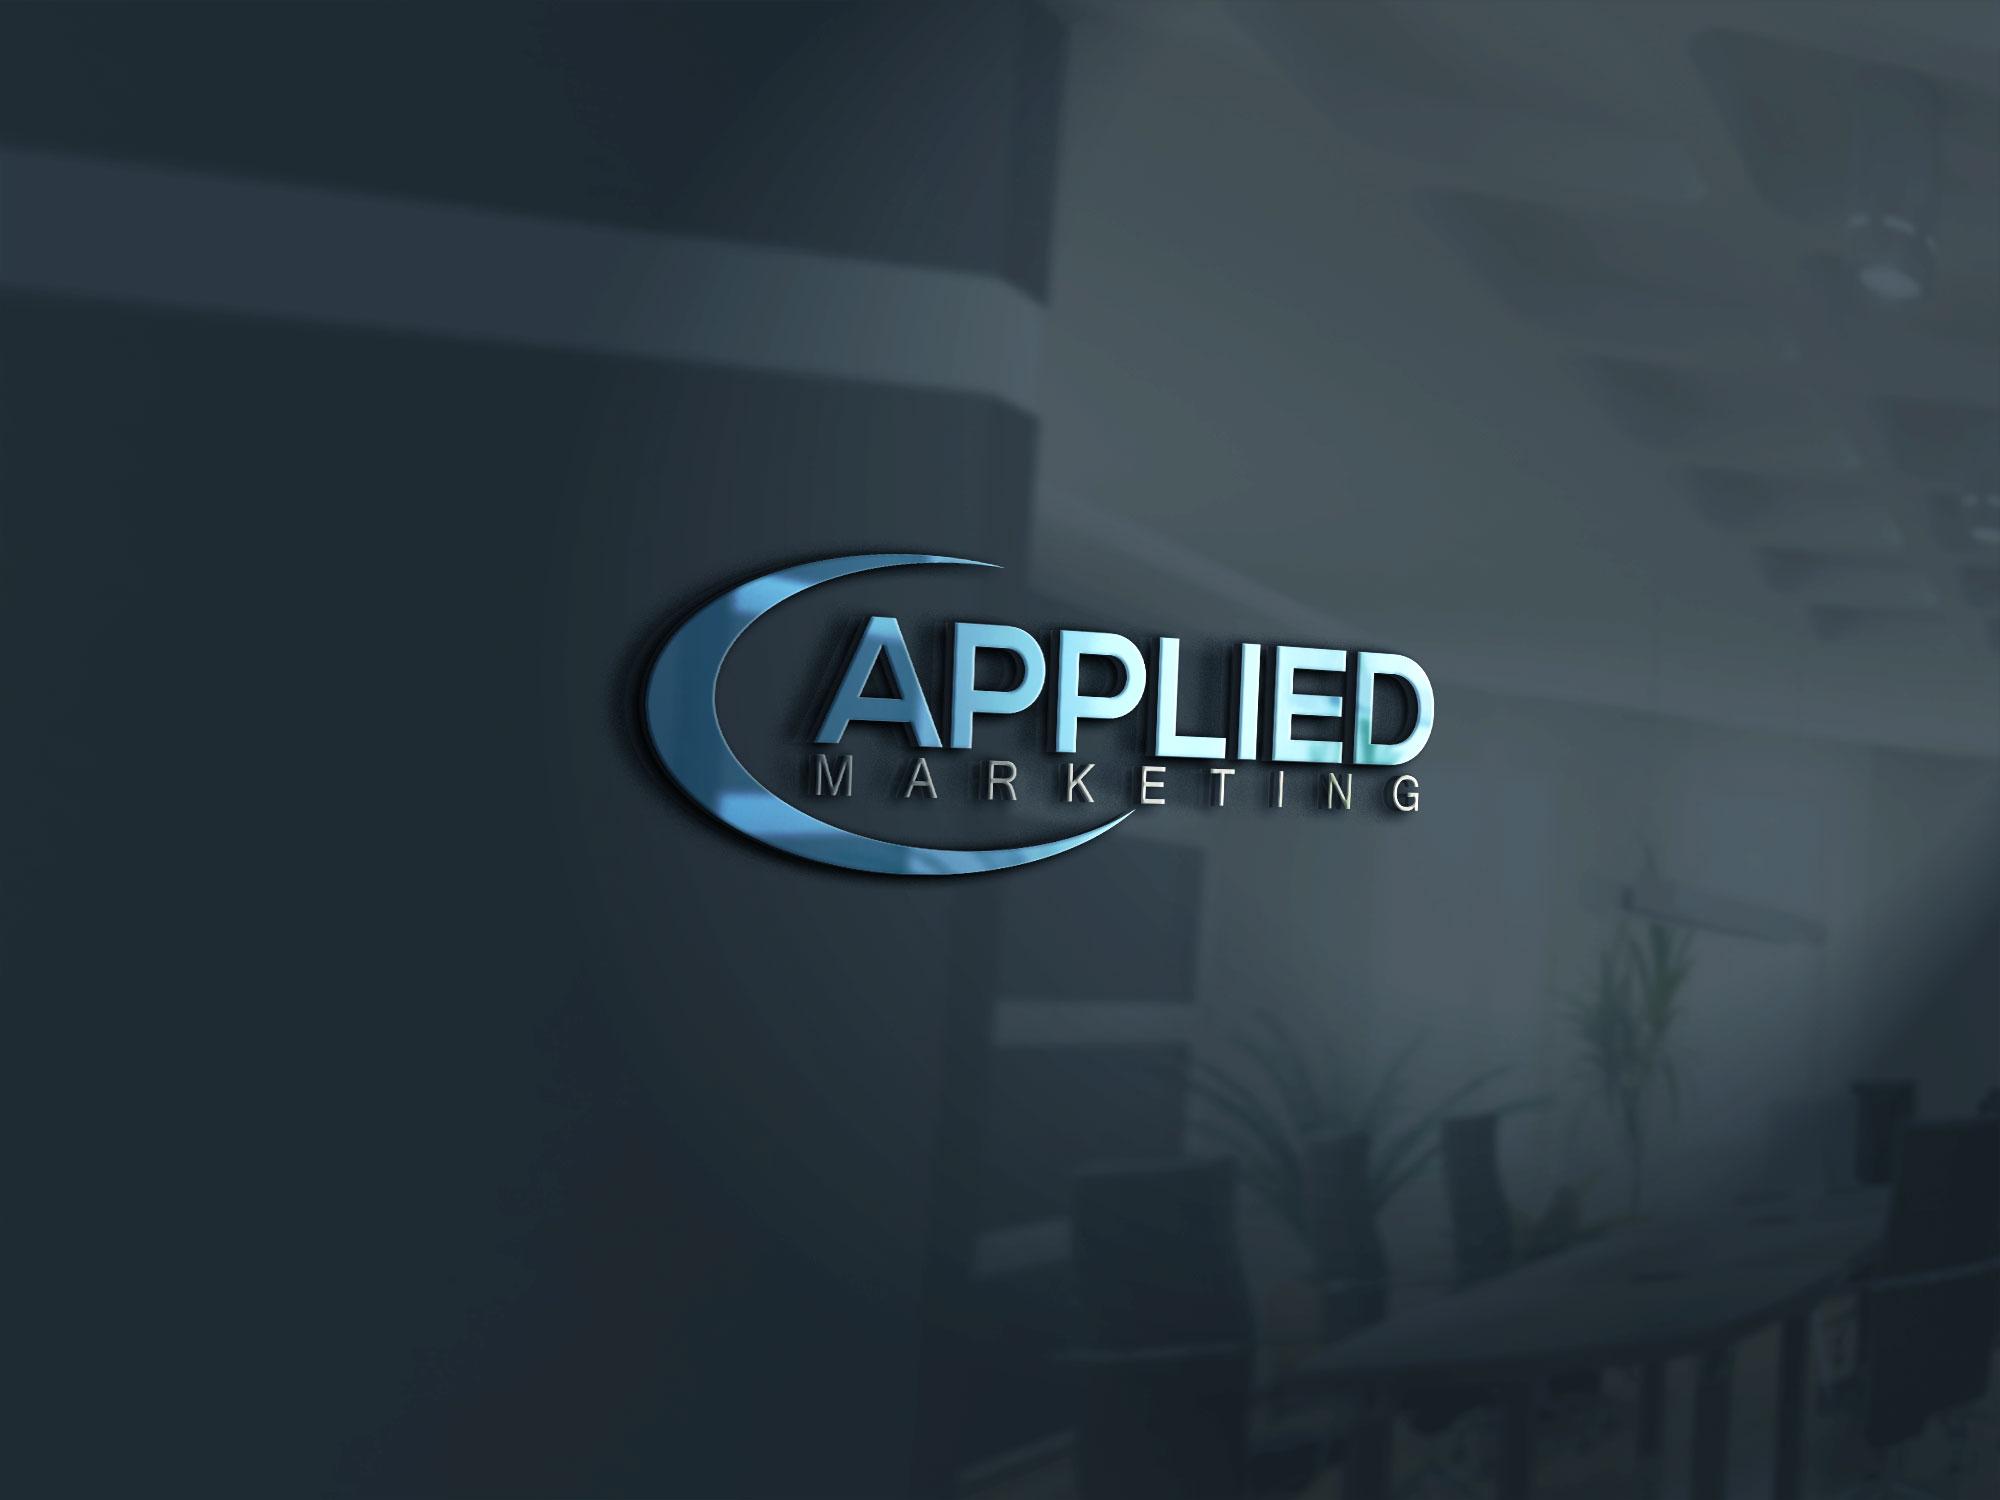 design high quality modern and minimal logo